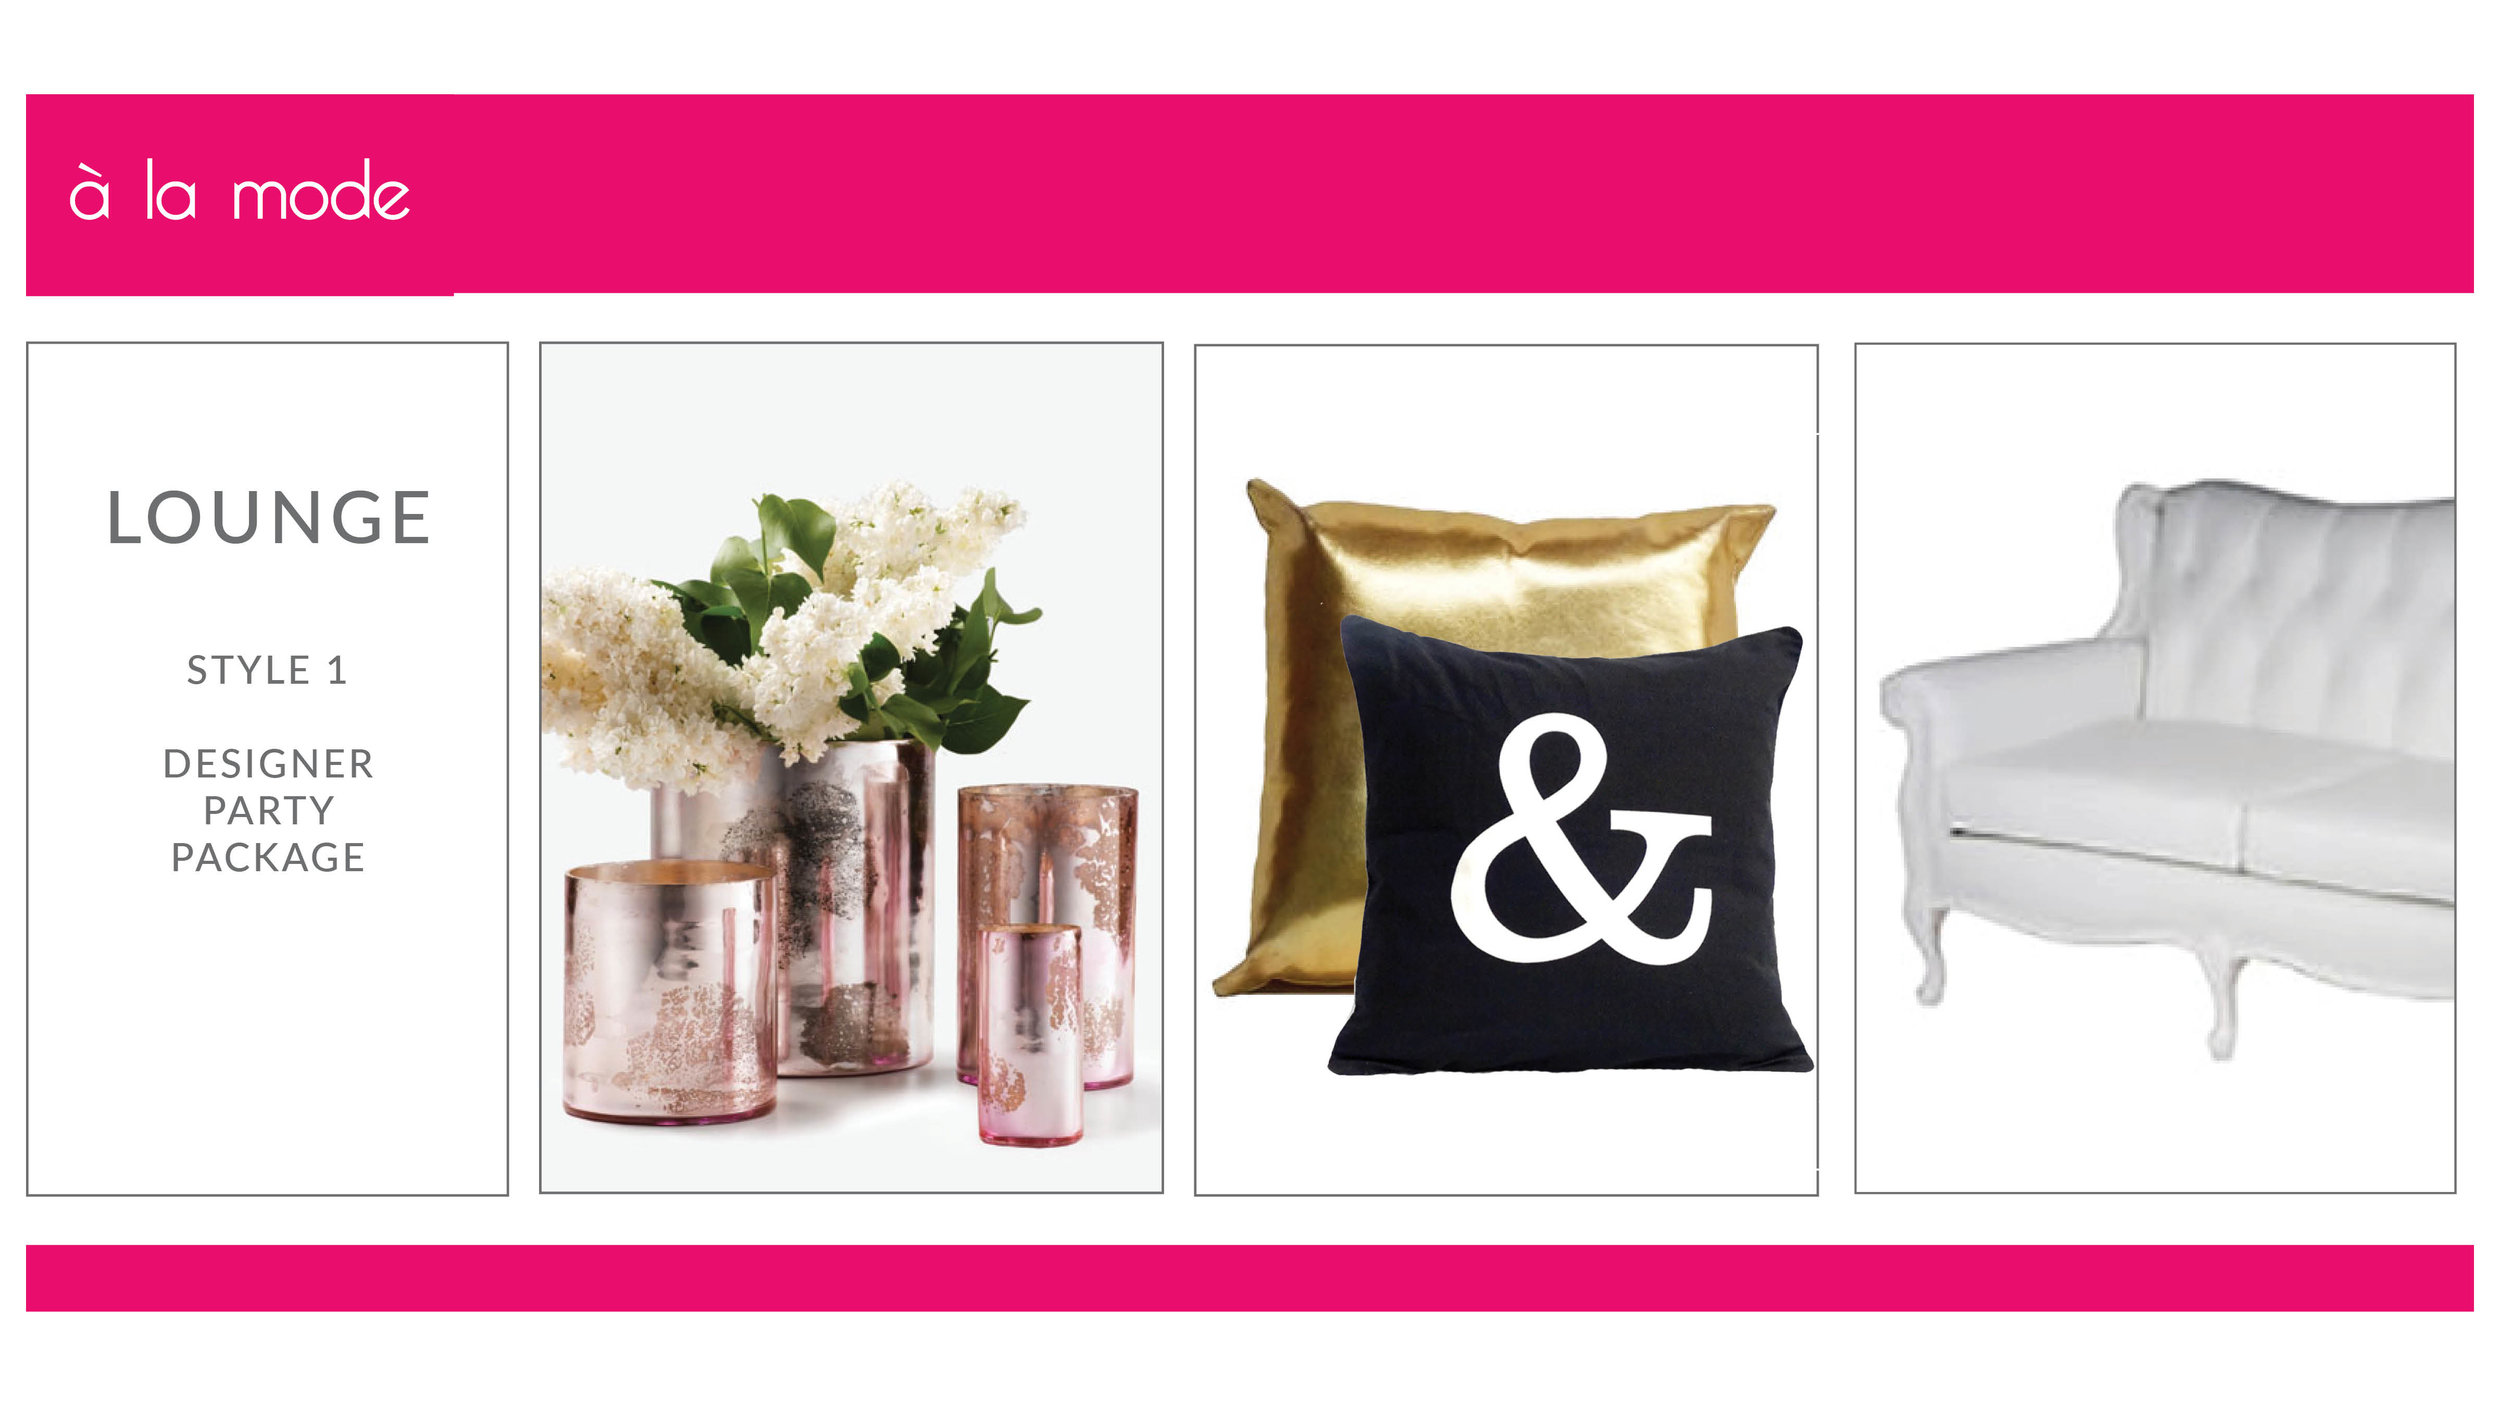 A La Mode Lounge Package: Style 1